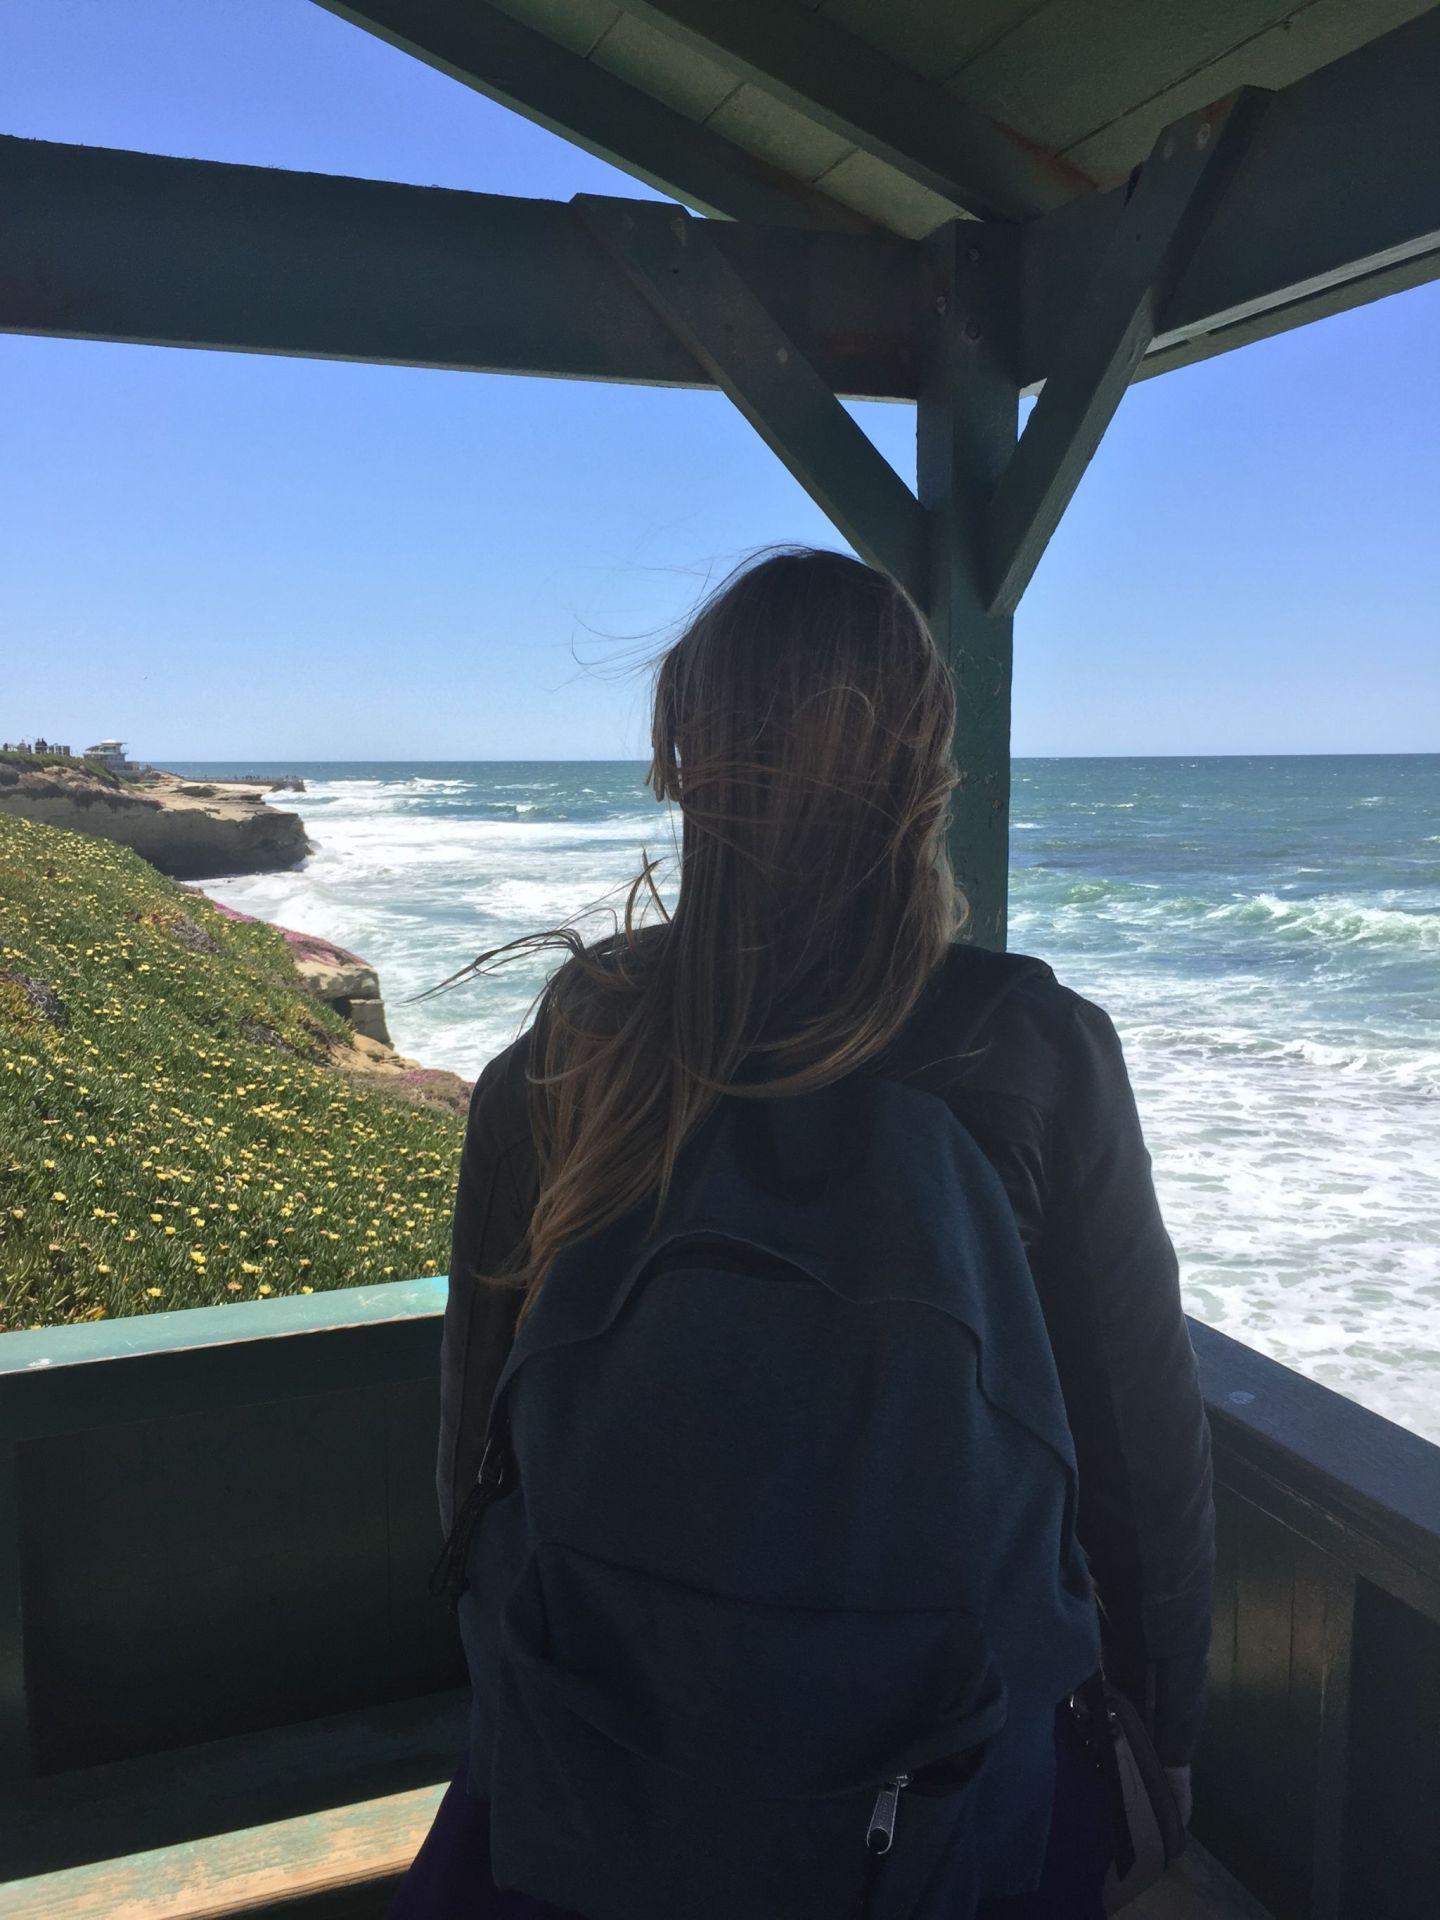 Enjoying the views at La Jolla, San Diego